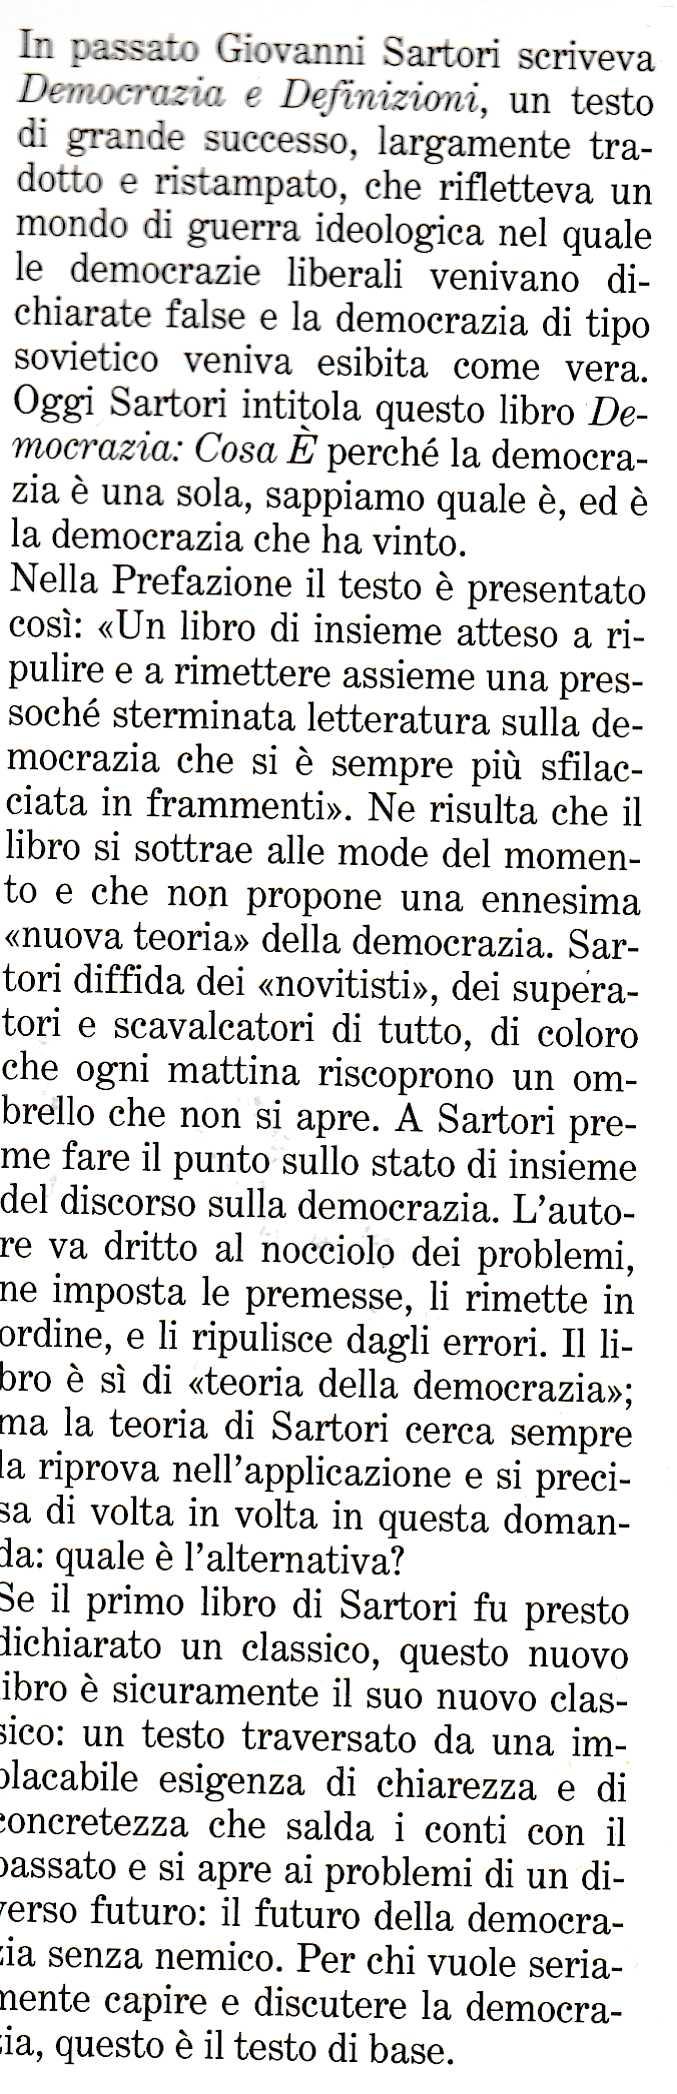 sartori642